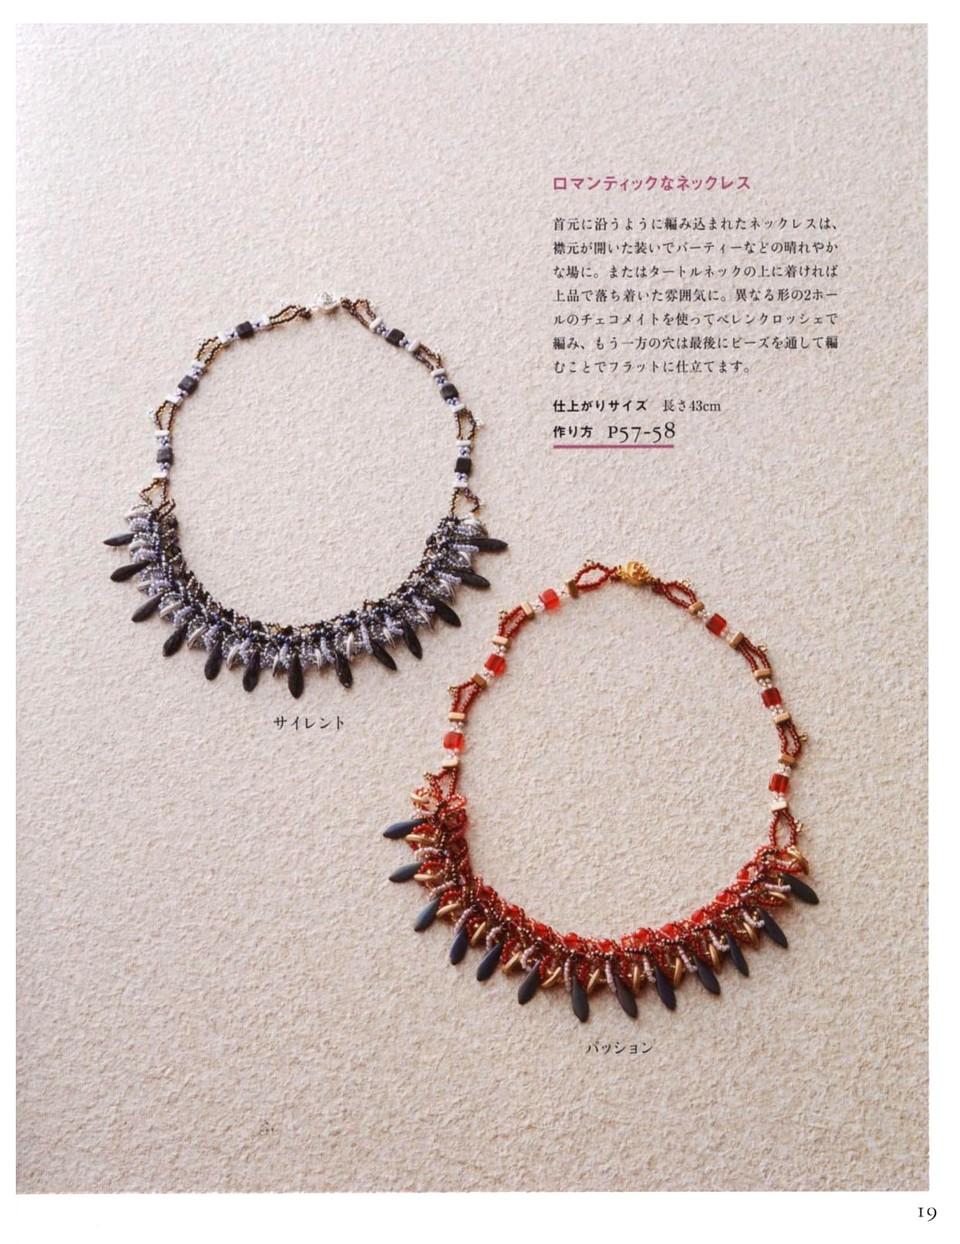 717 Beads Crochet 17-20